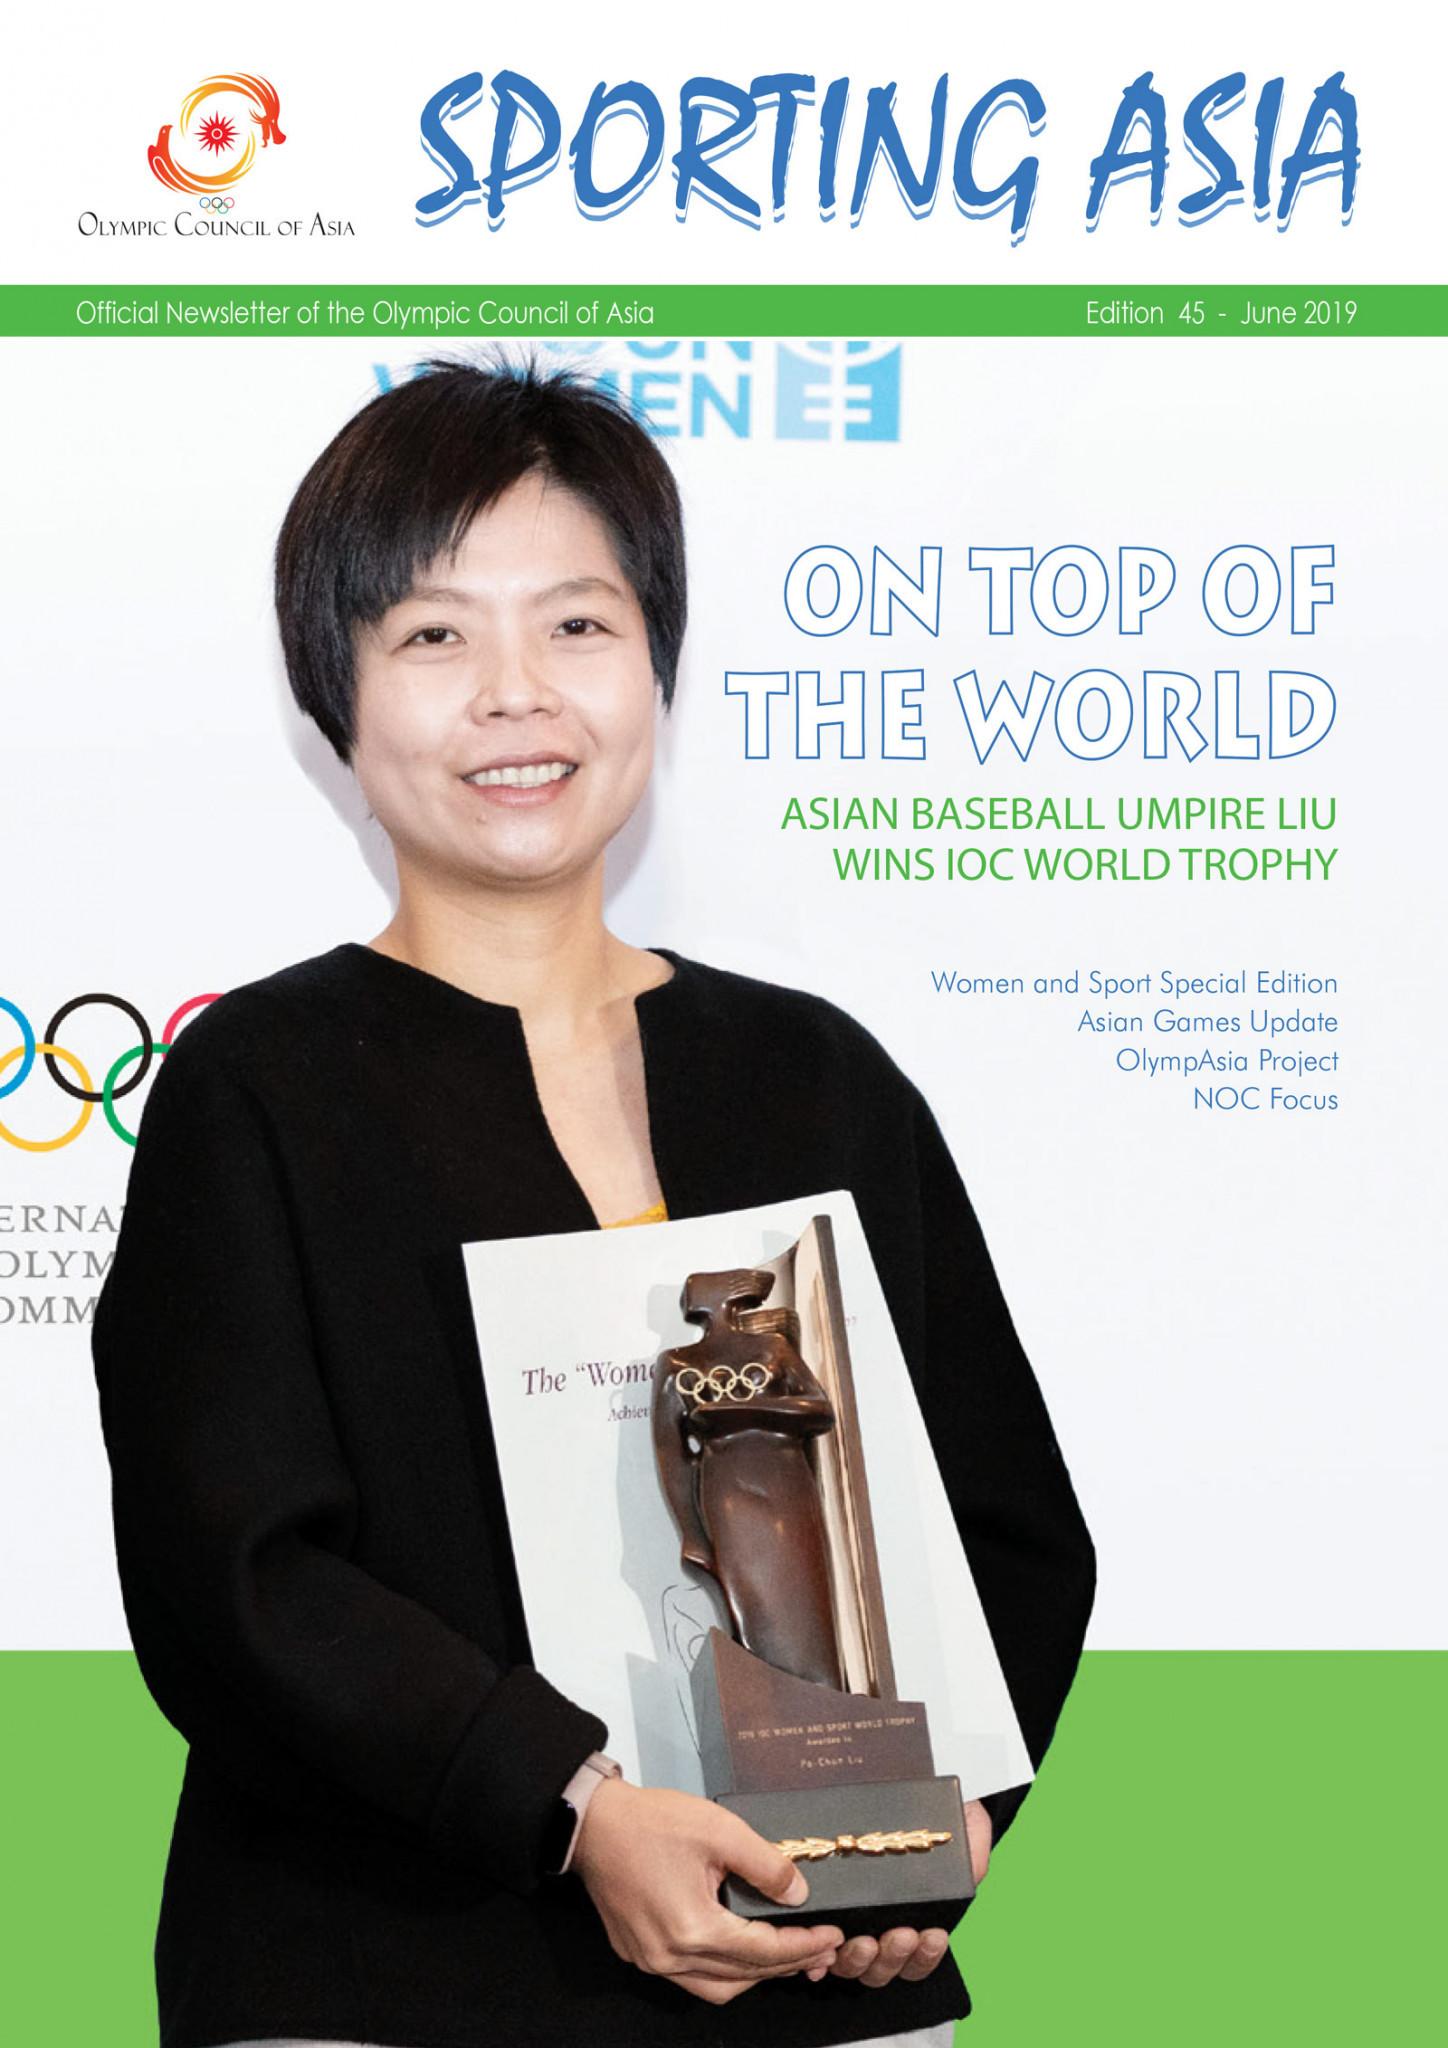 Sporting Asia - Edition 45 - JUN 2019